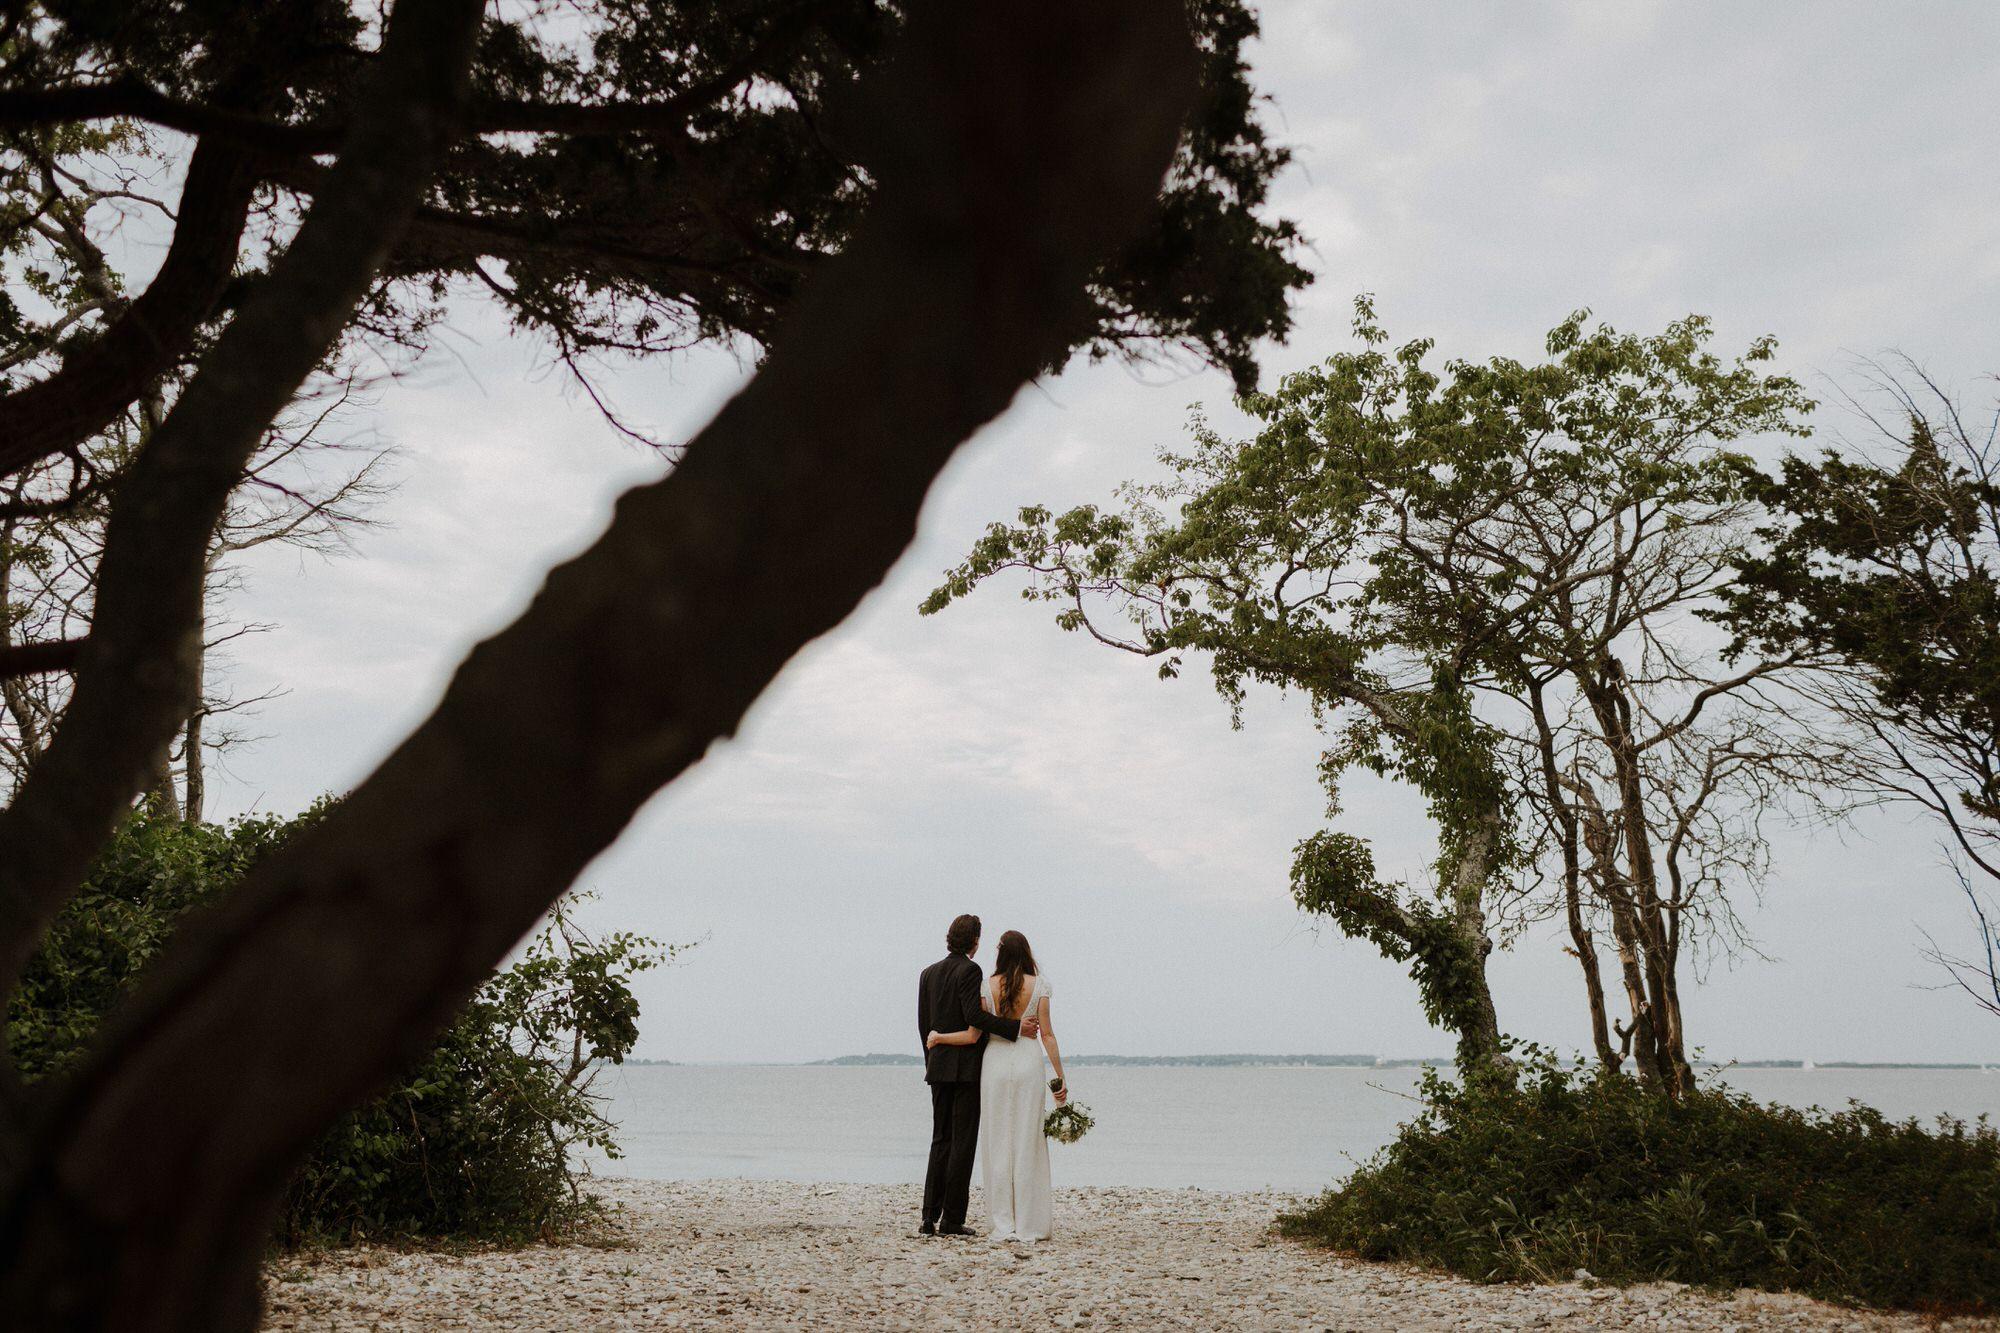 214_Rams Head Inn wedding photography, Shelter Island, New York_Island Wedding.jpg